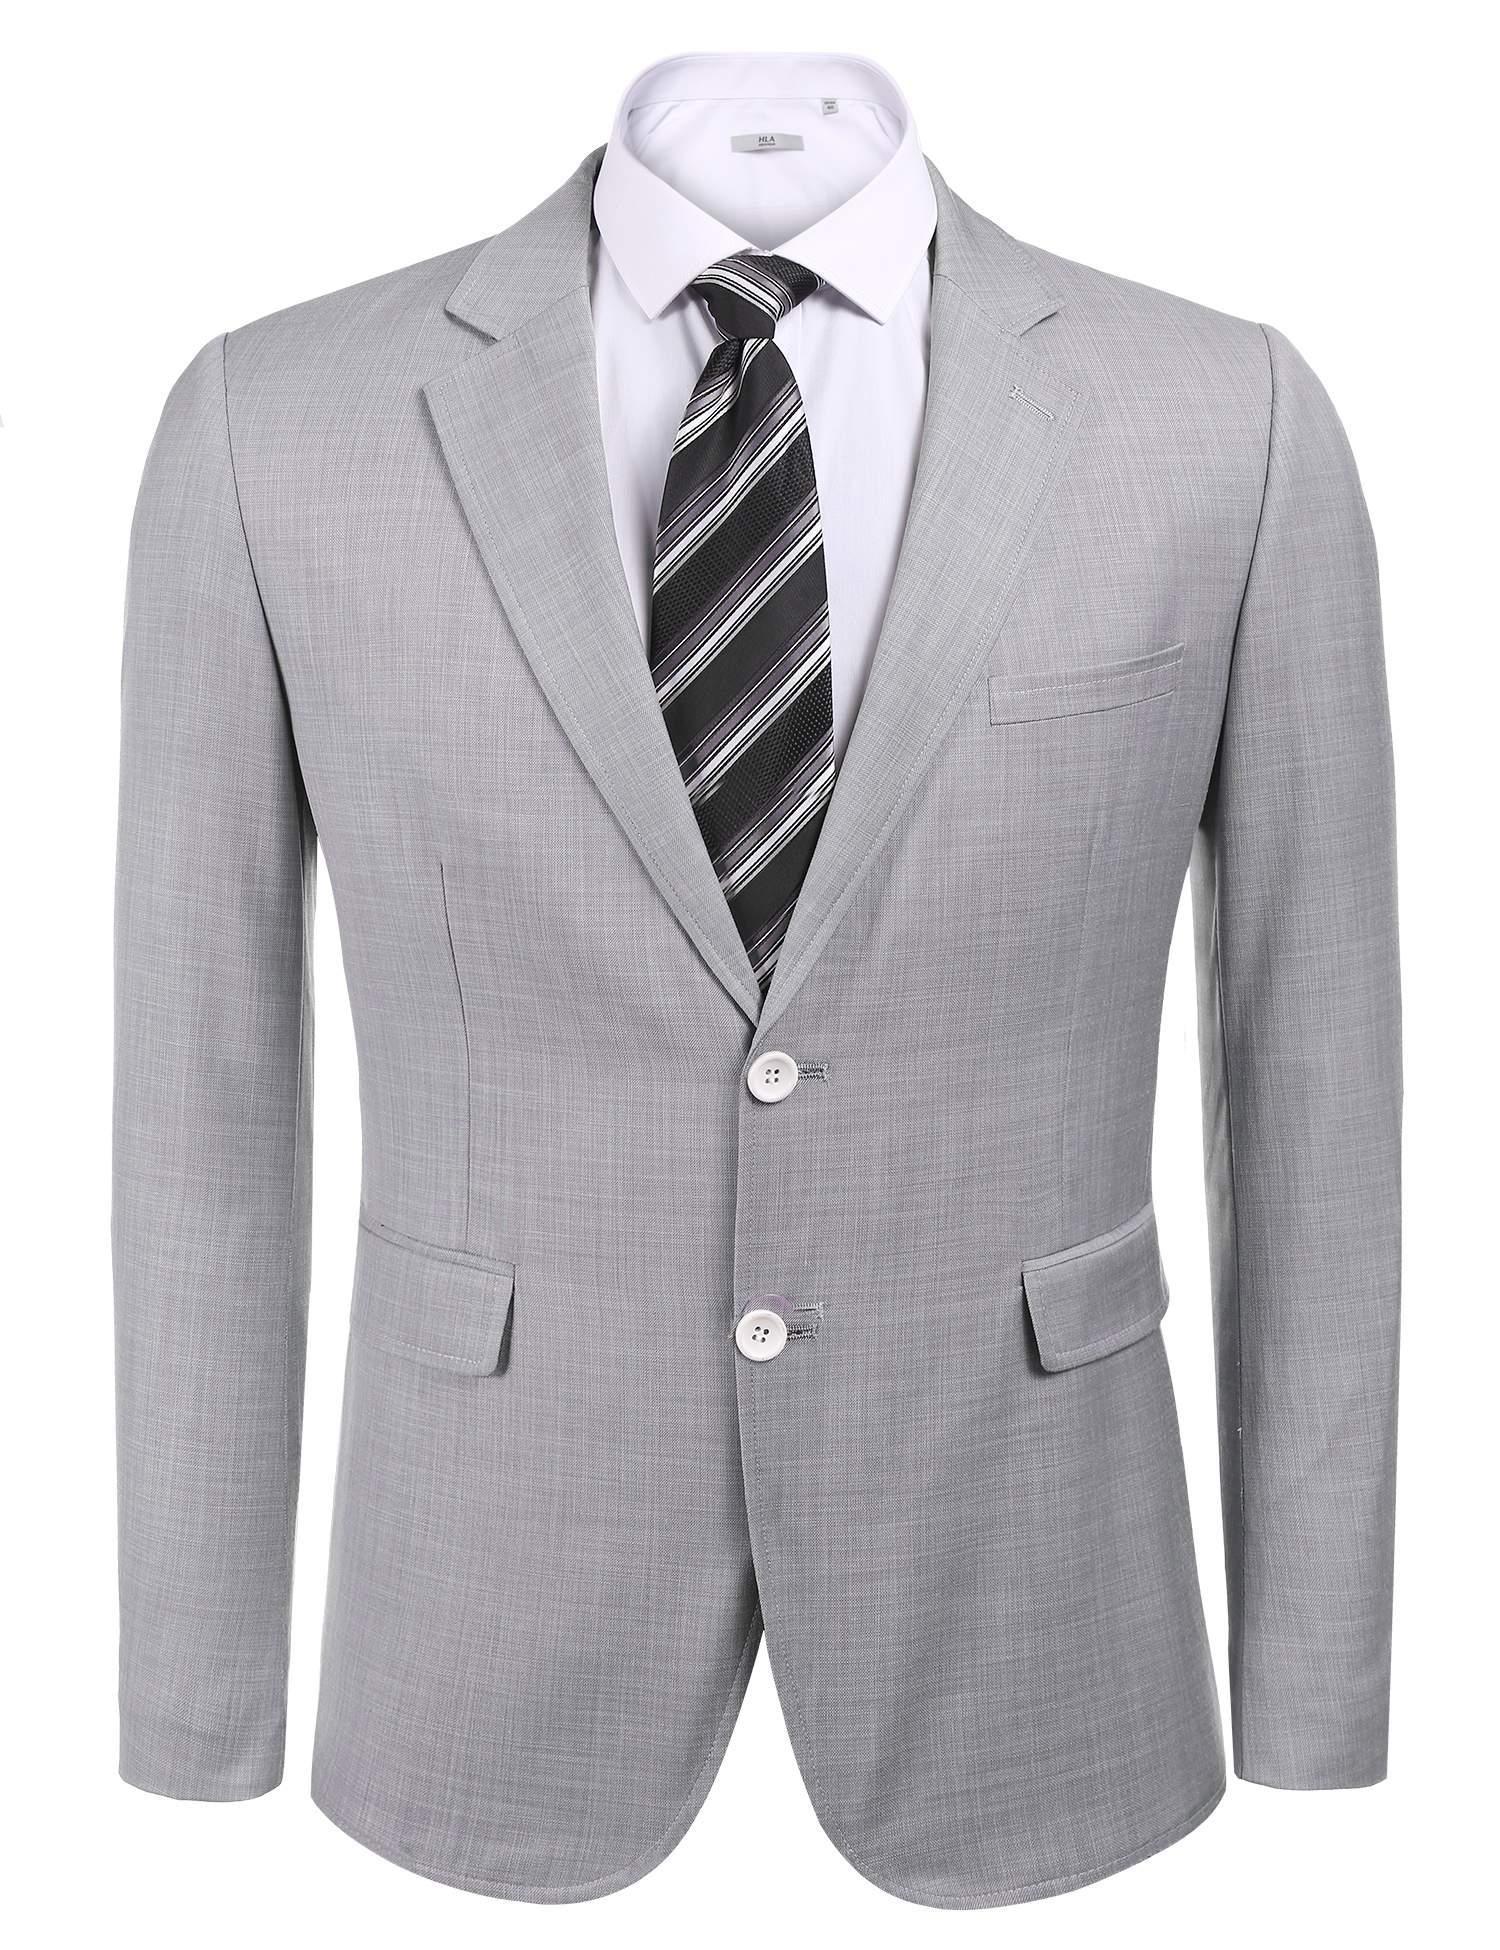 COOFANDY Men's Elbow Patchwork Suit Jacket Stylish Wedding Blazer